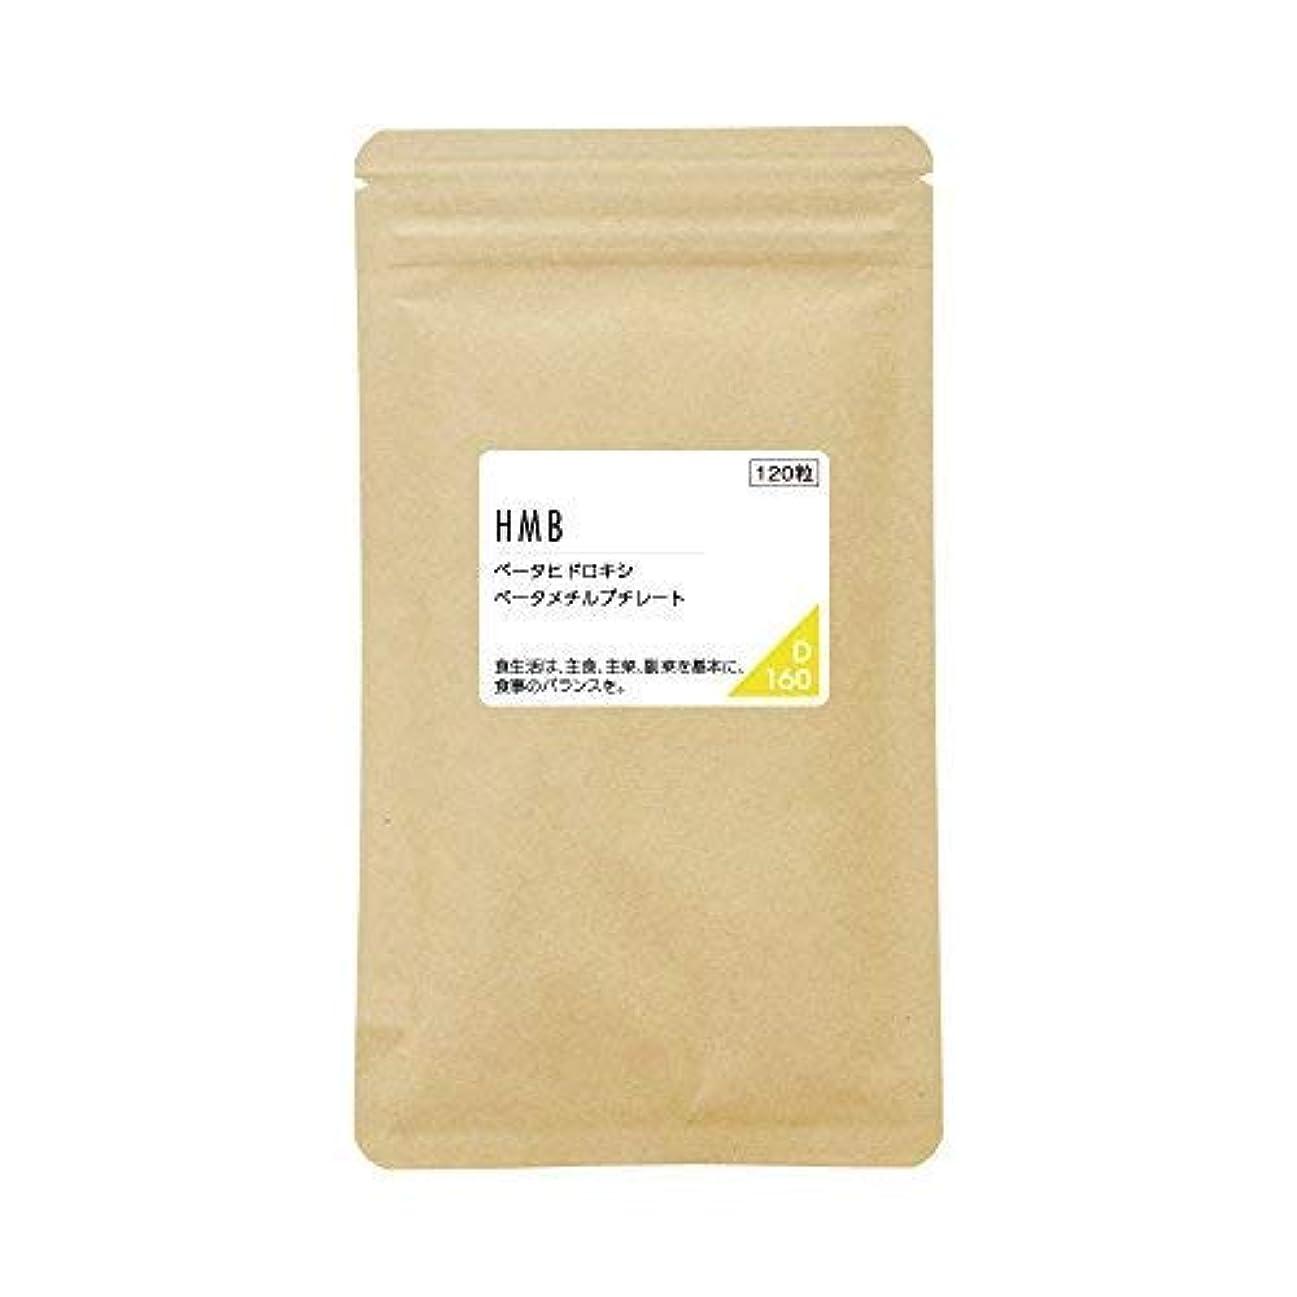 nichie HMB カルシウム サプリ 錠剤 120粒